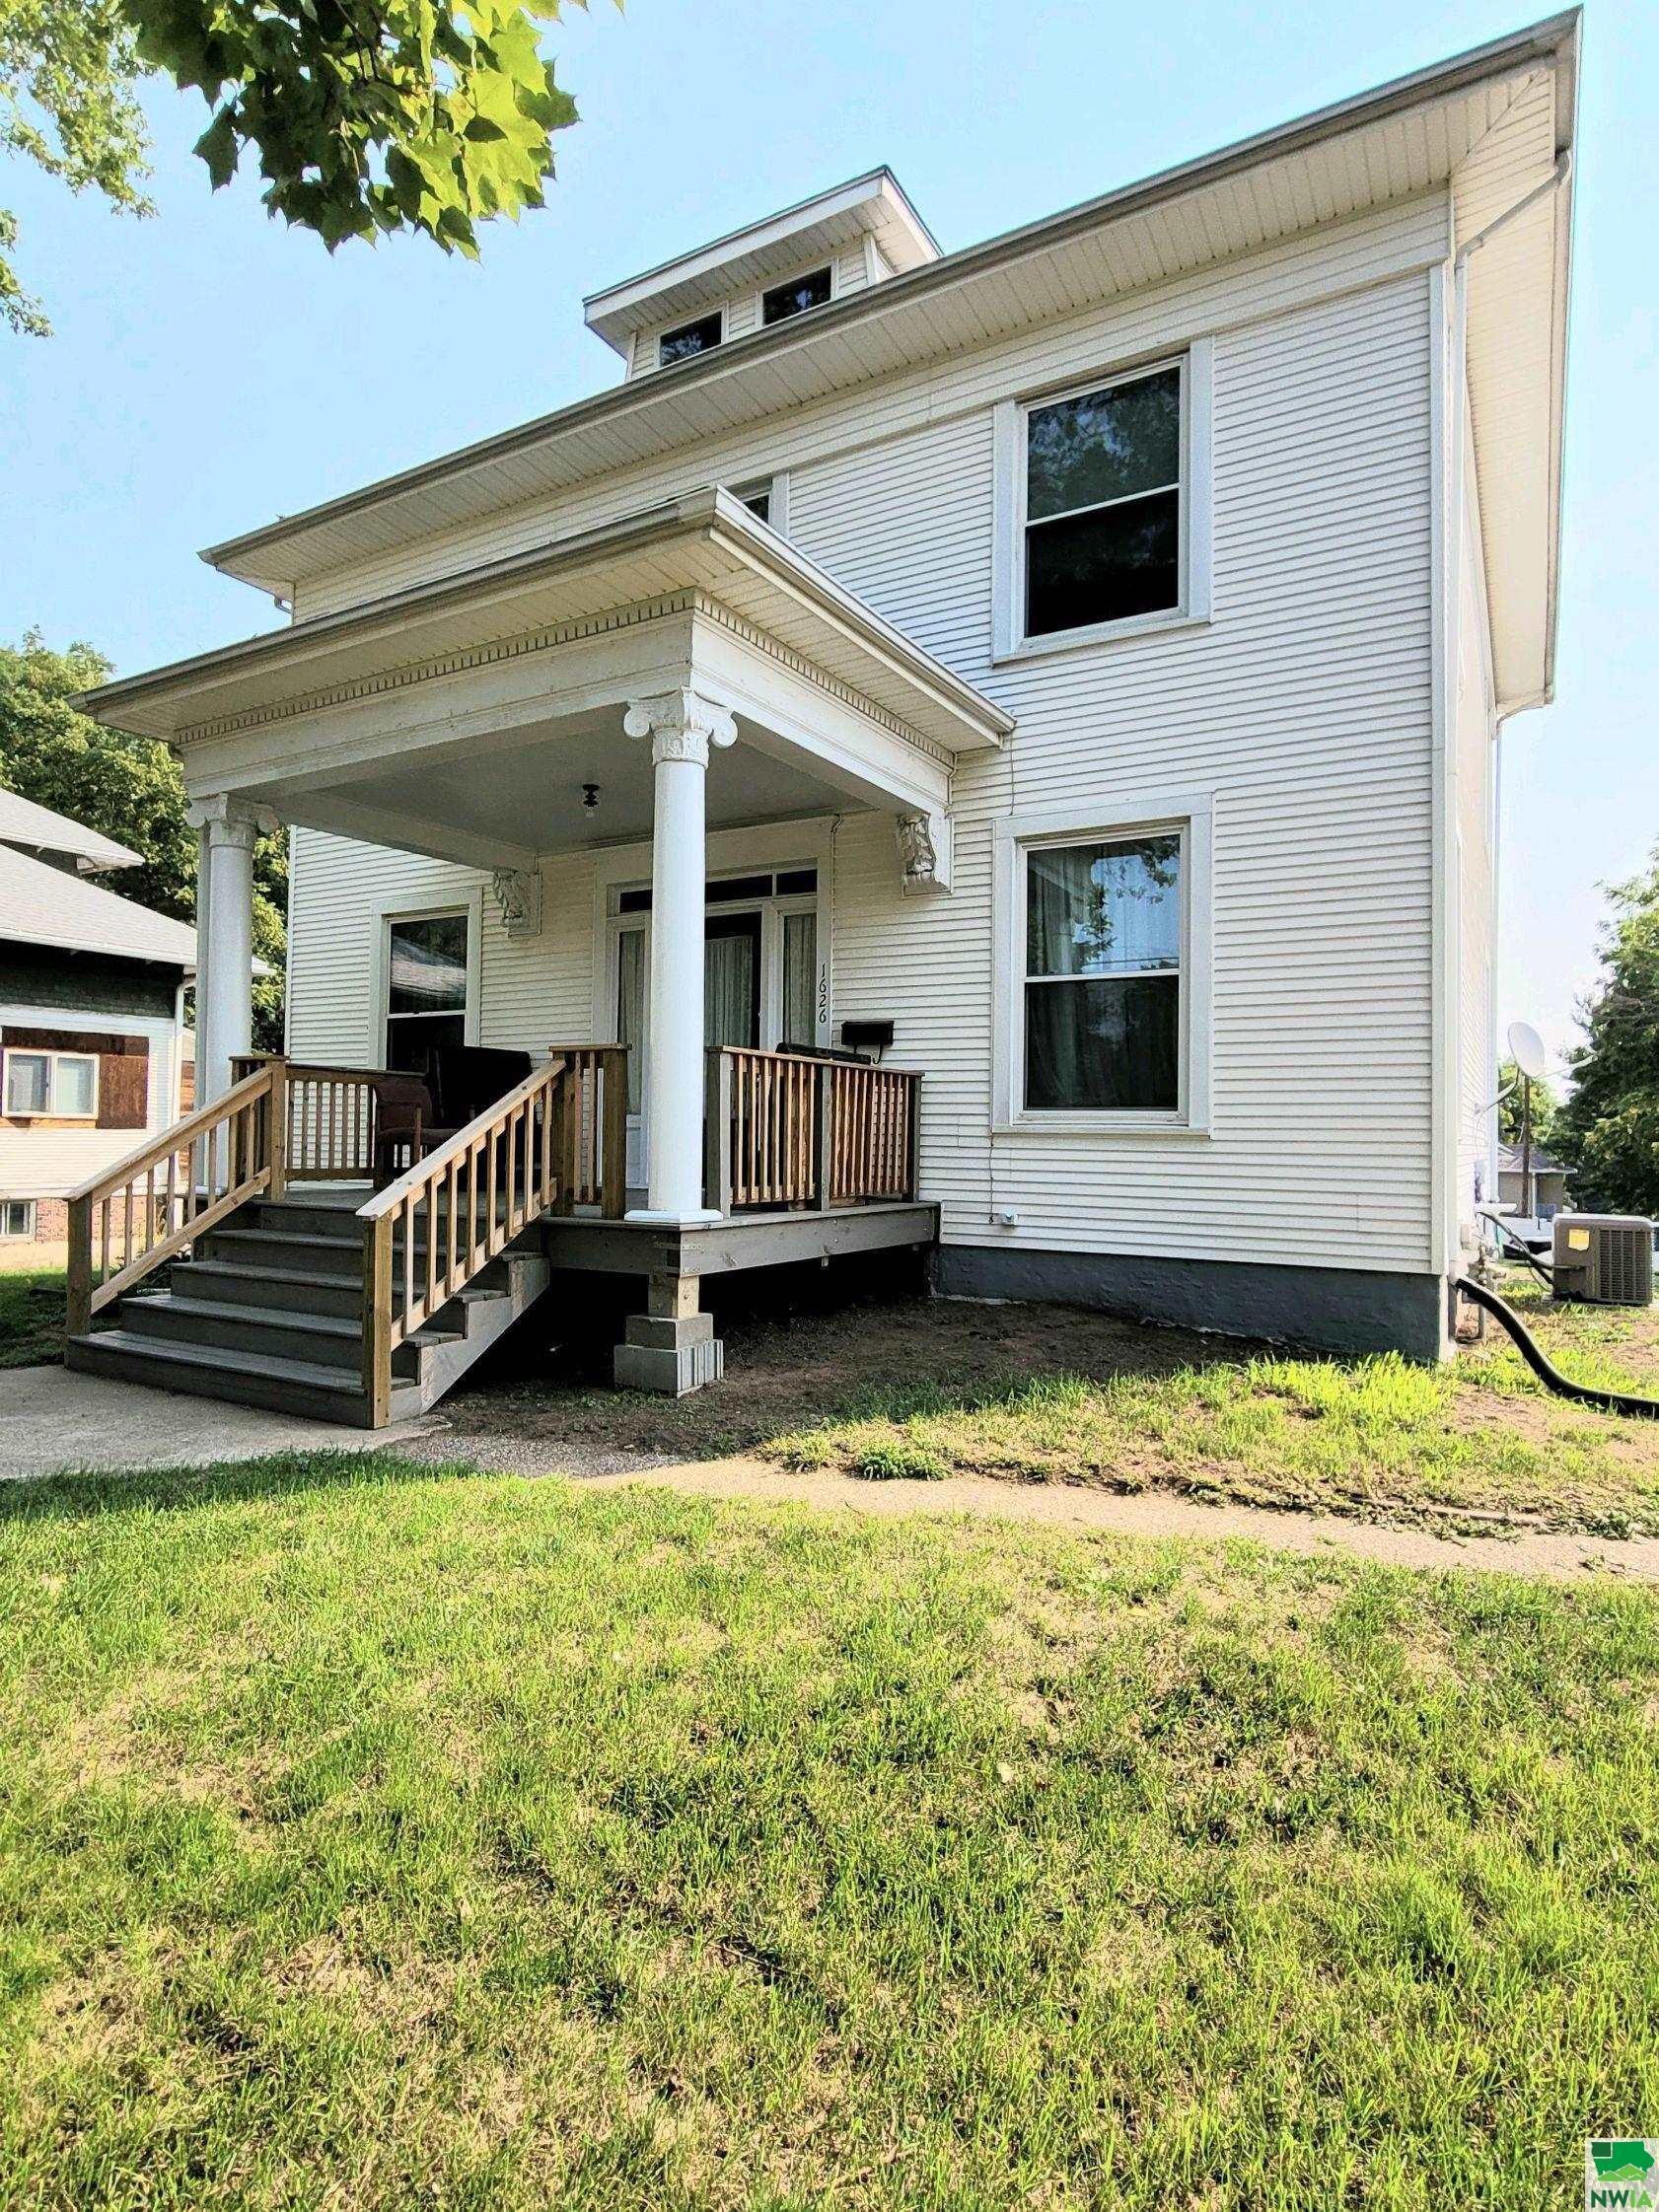 Homes For Sale at Morningside Ave